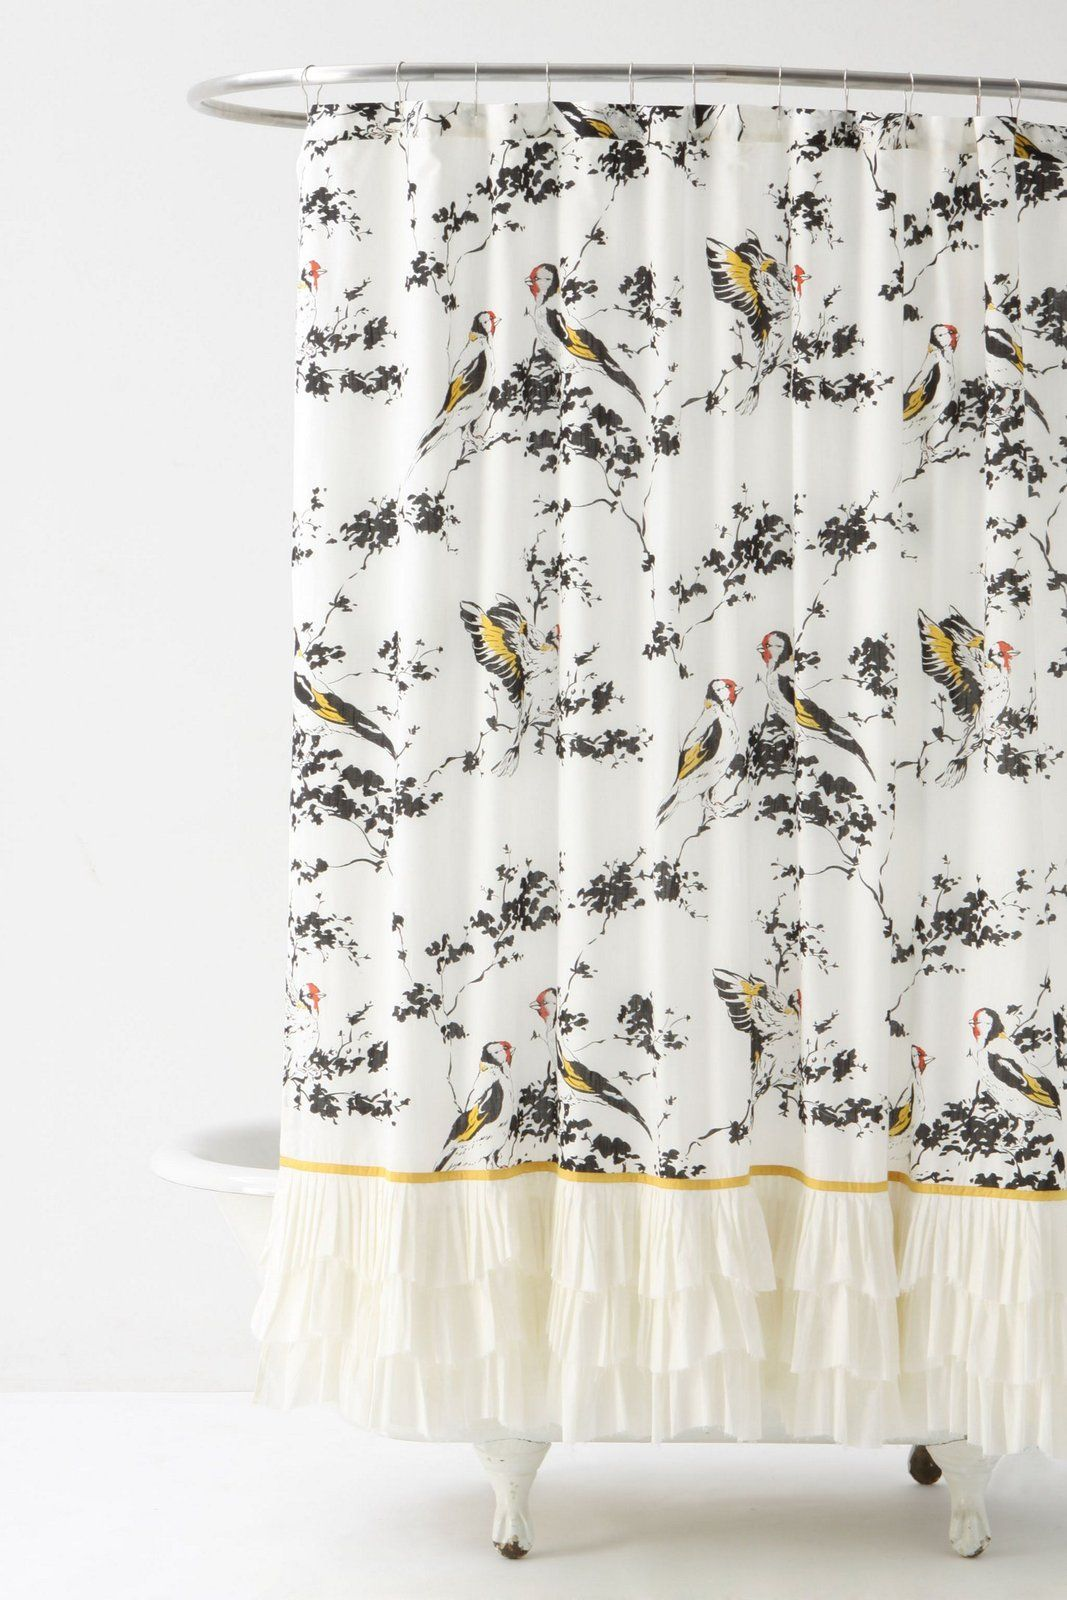 Chaffinch Shower Curtain   Anthropologie ( Shower Curtains Fabric Modern  Pattern Yellow White Black Bath)